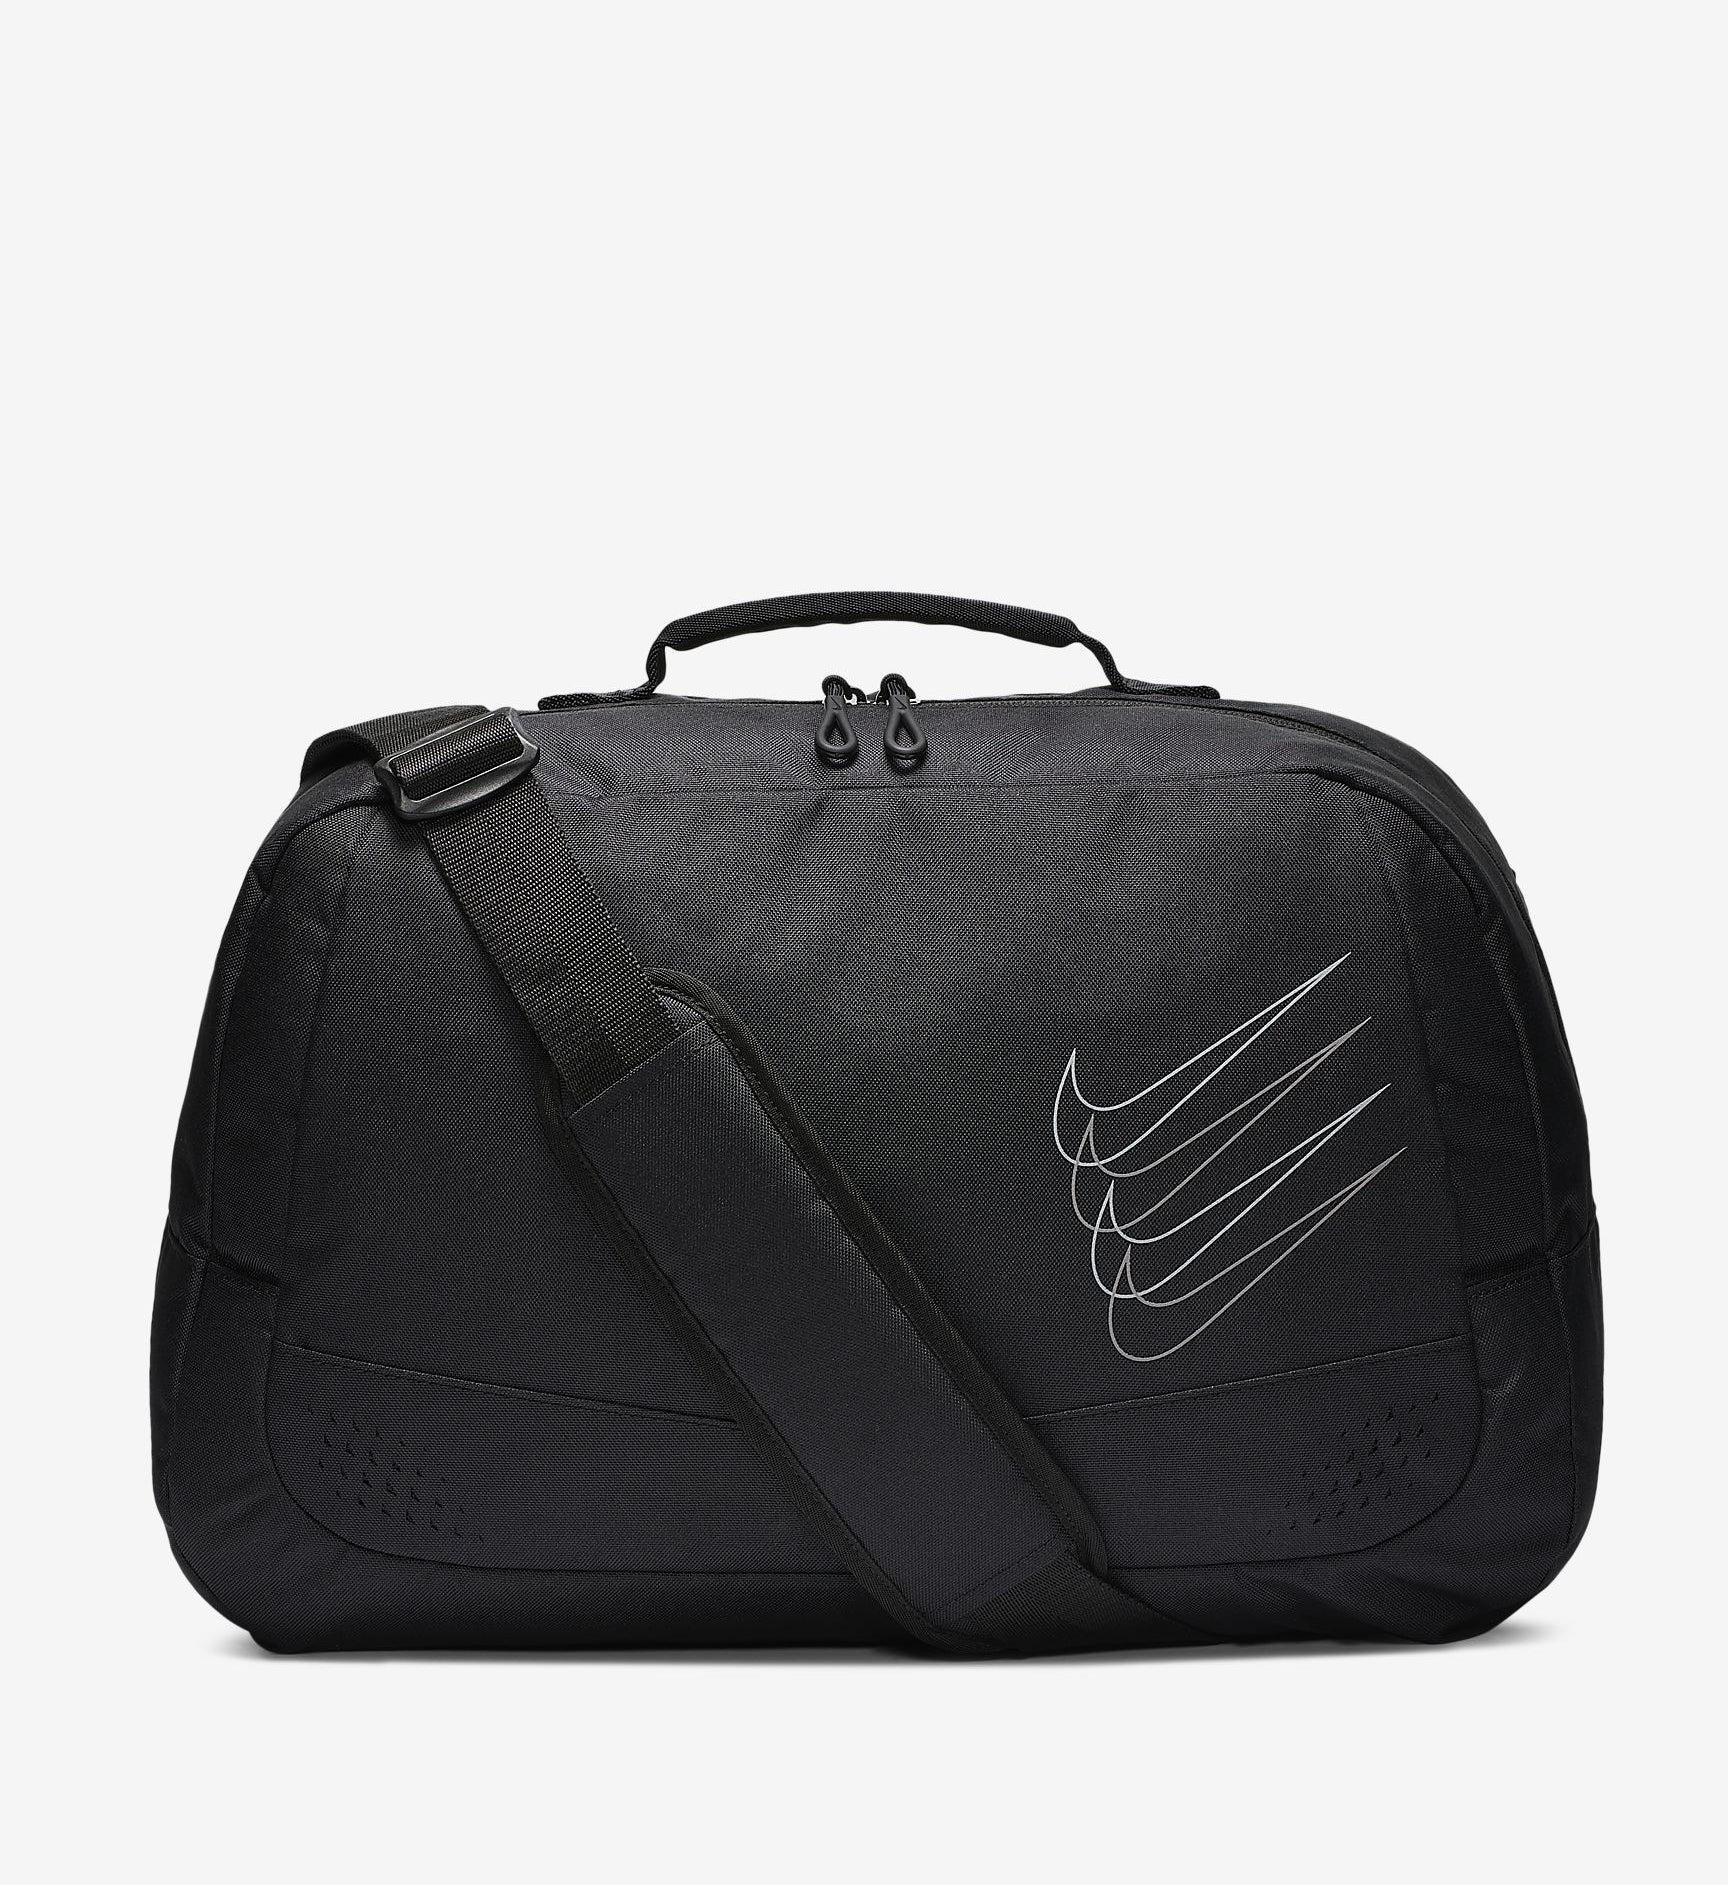 the duffel